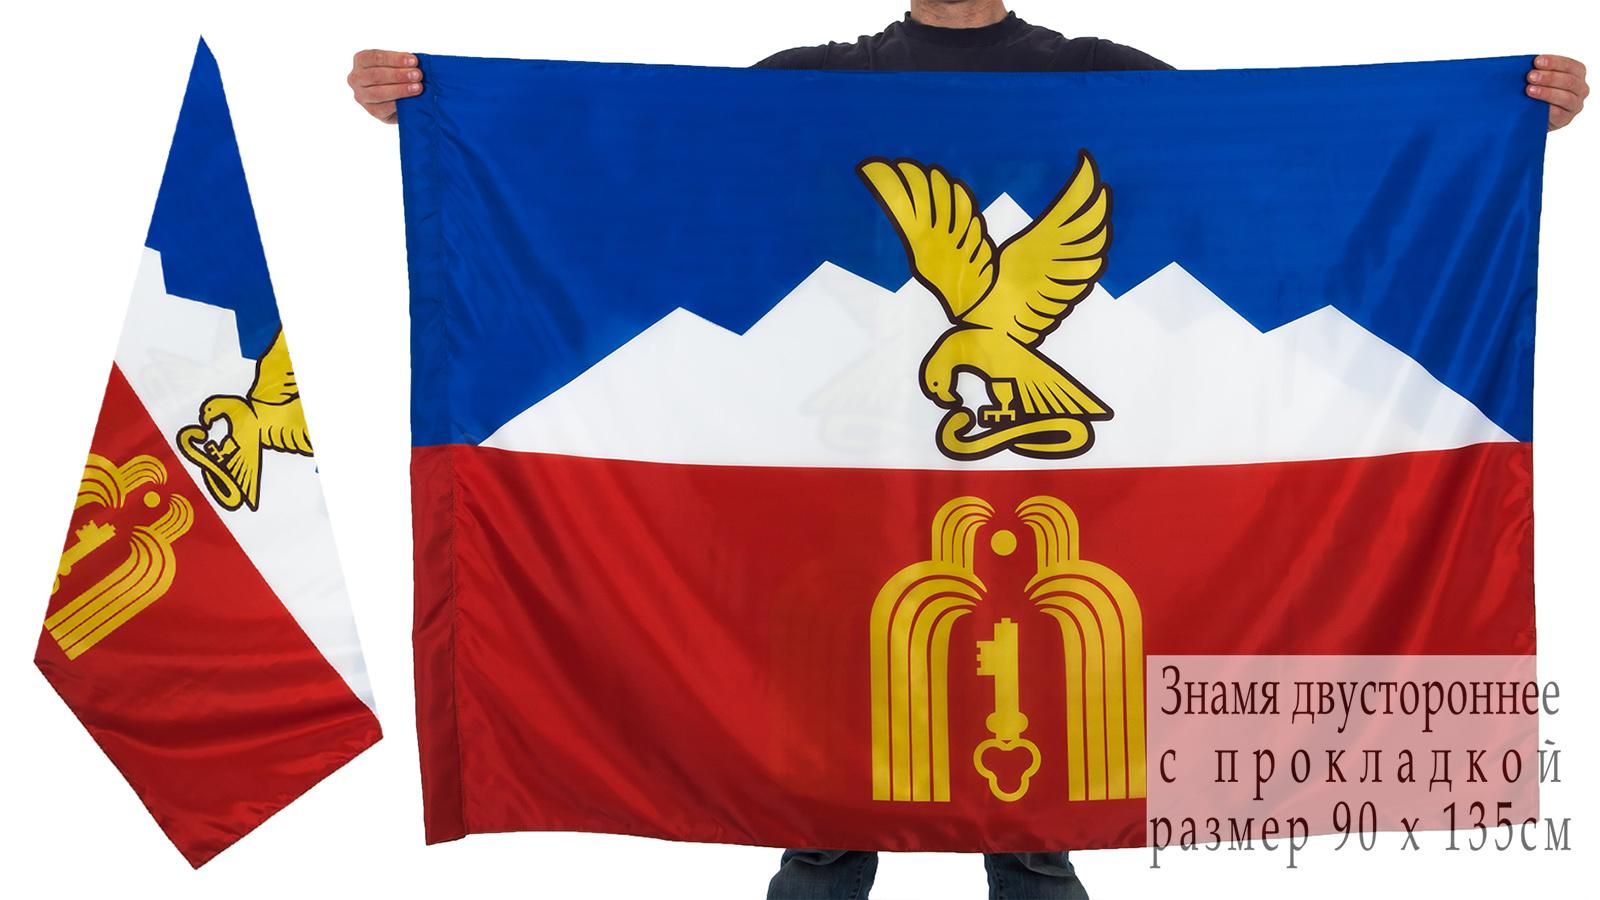 Двухсторонний флаг Пятигорска